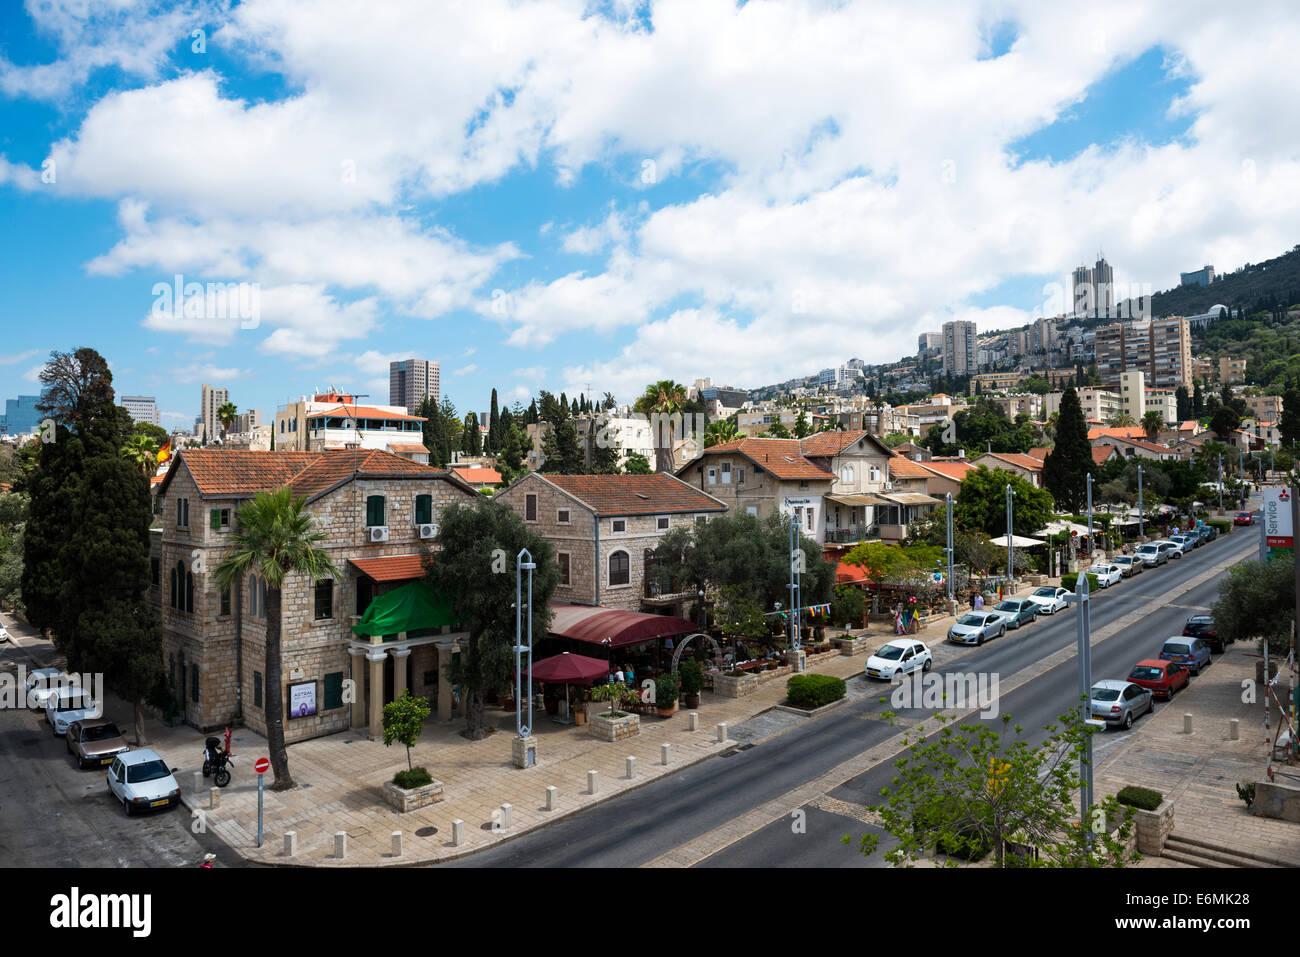 A view of the German colony neighborhood in Haifa. - Stock Image